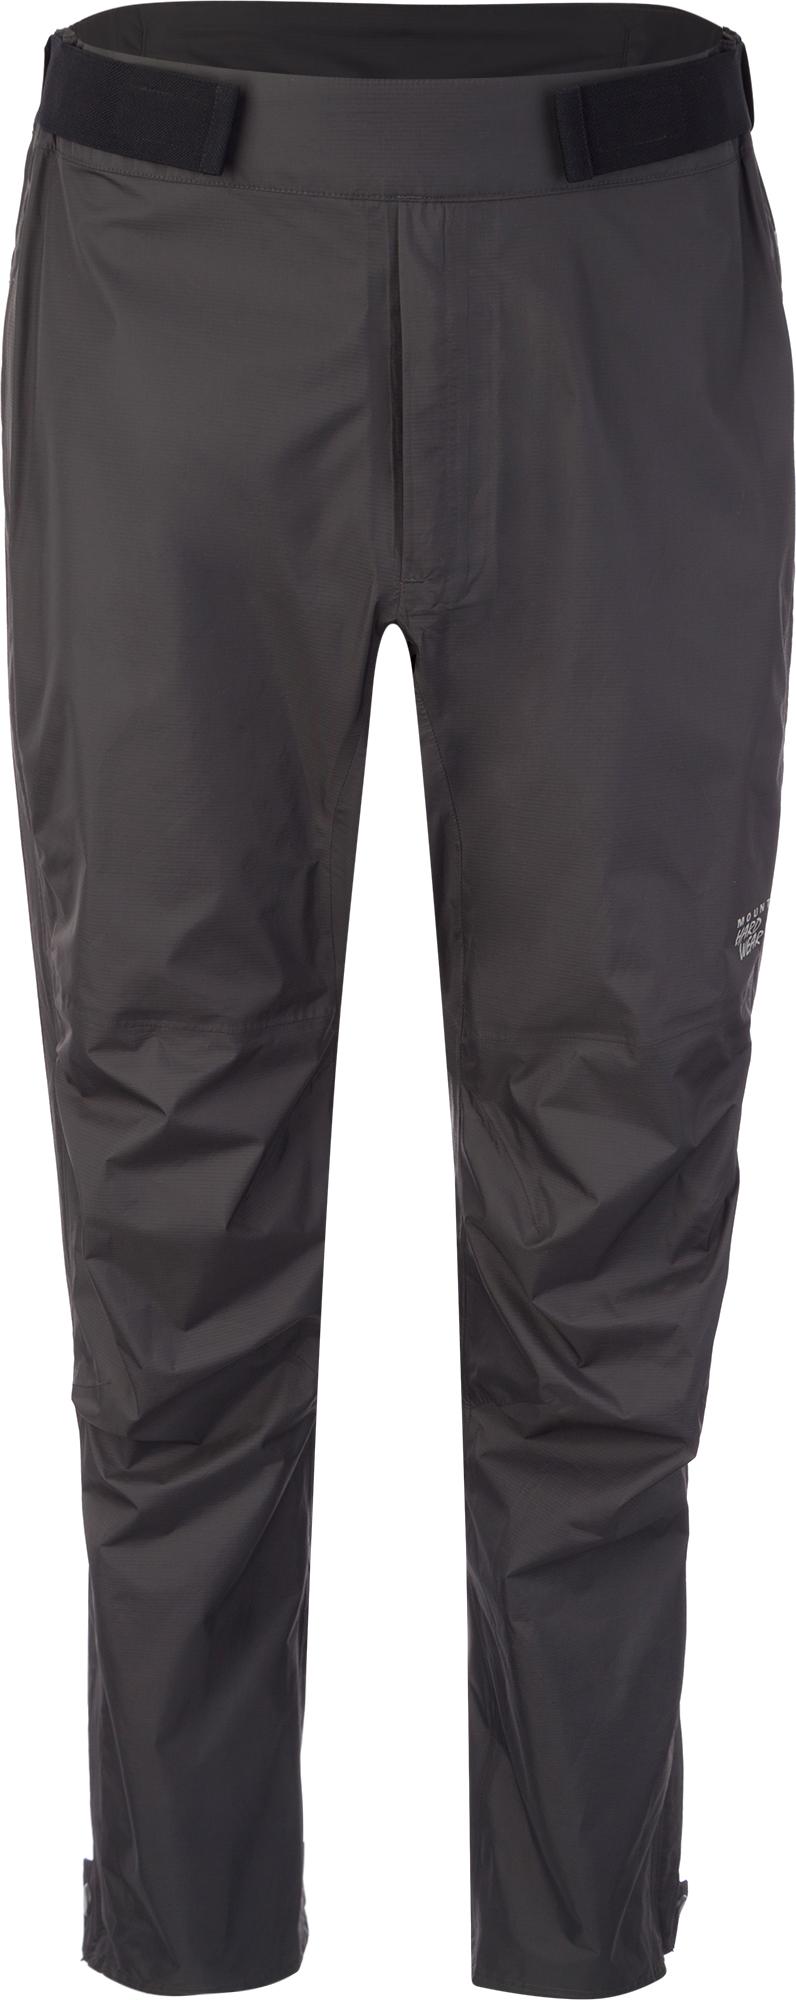 Mountain Hardwear Брюки мужские Mountain Hardwear Exposure/2, размер 54